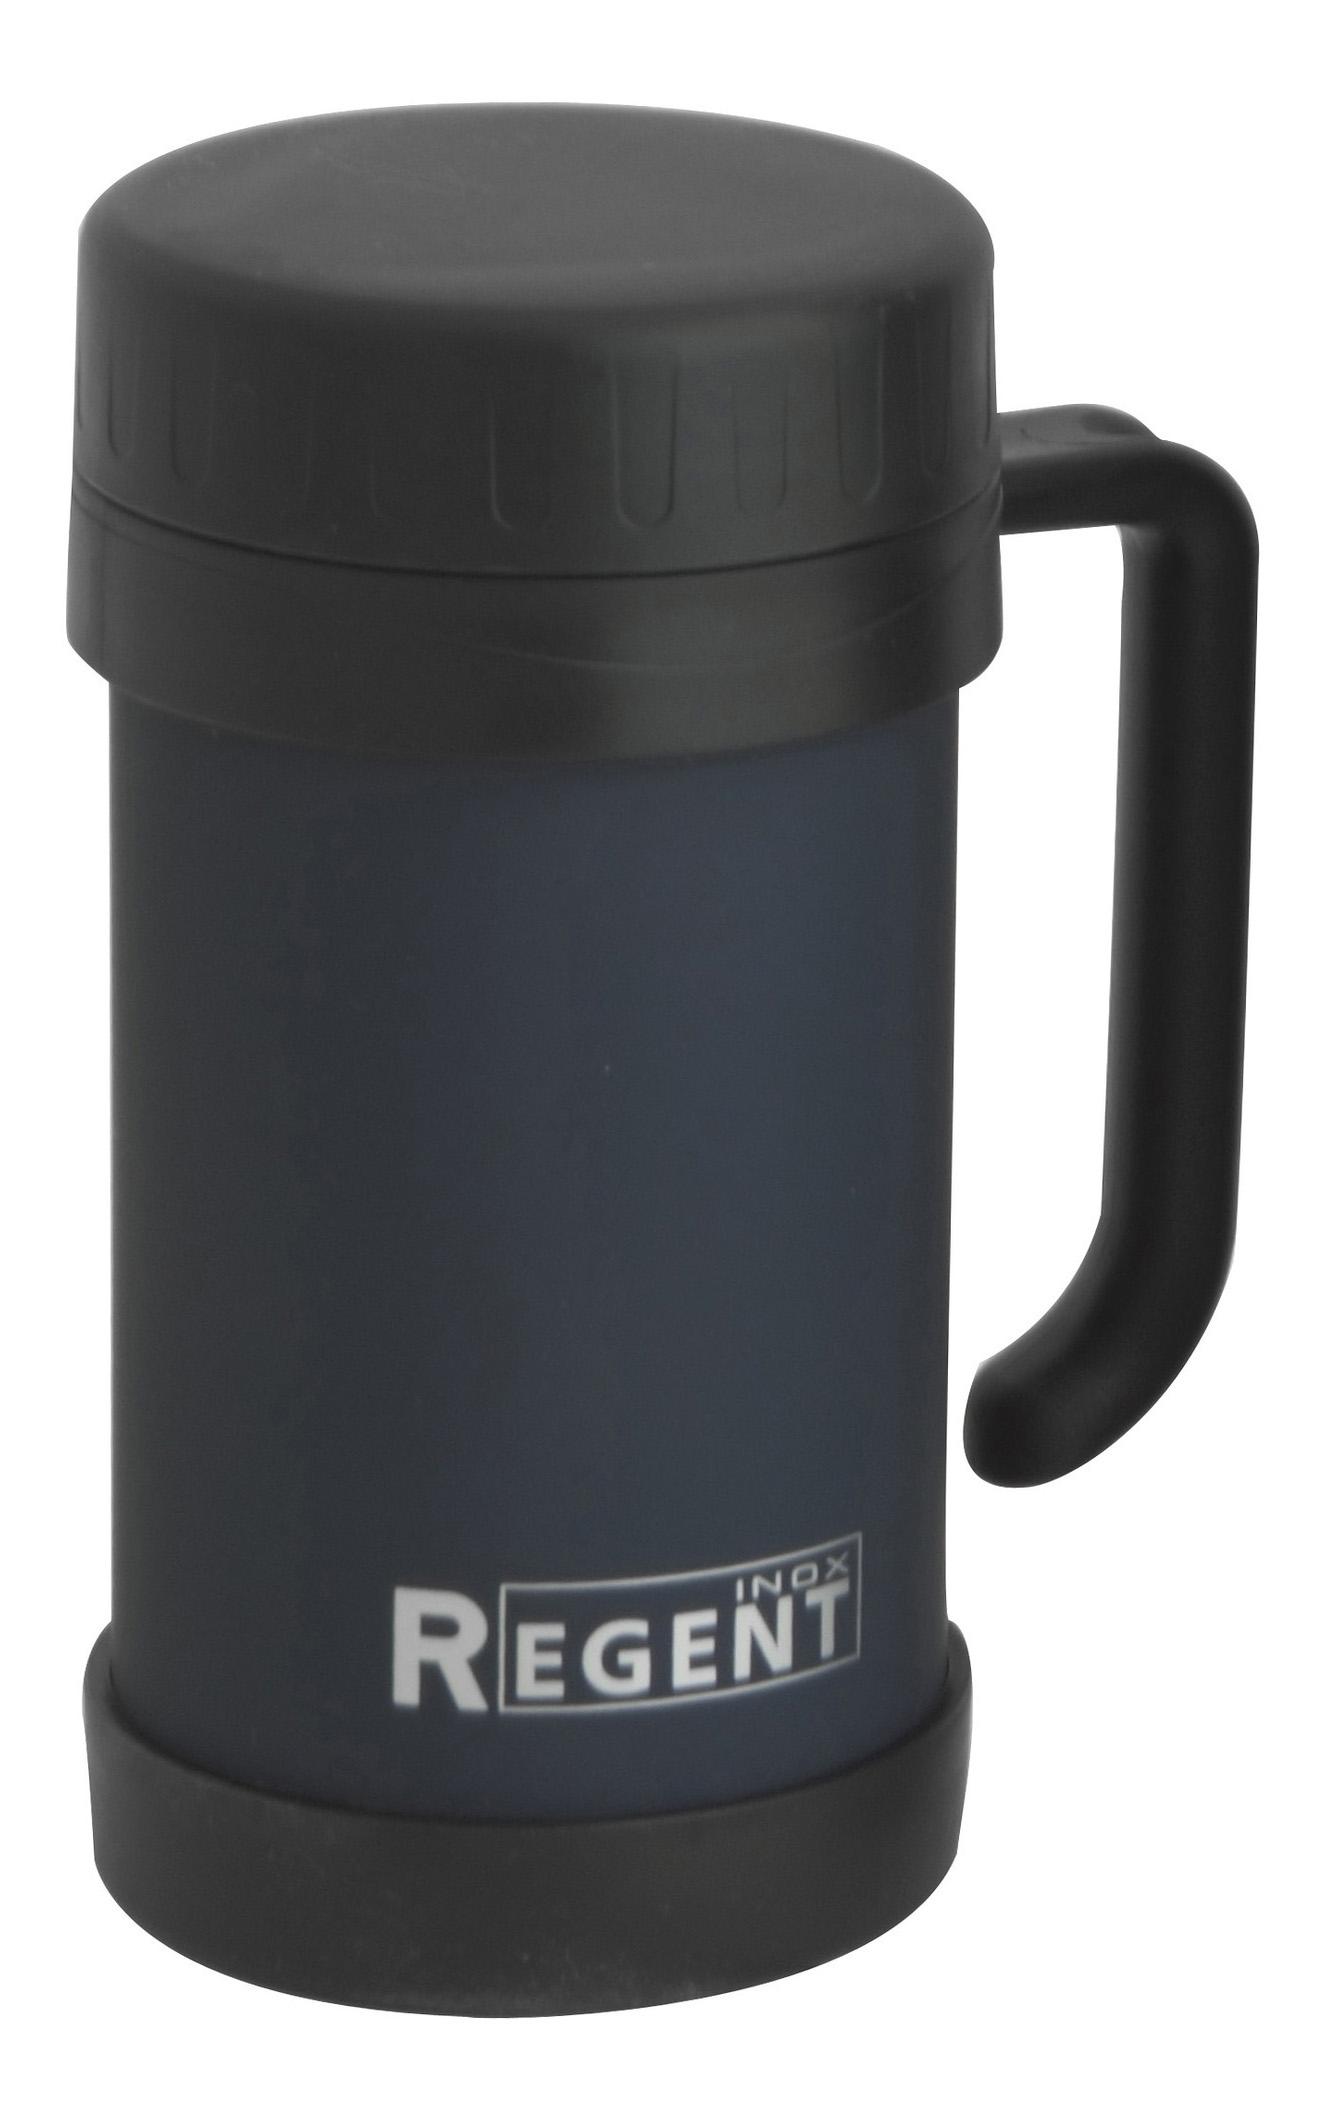 Термокружка REGENT inox Gotto 0.5 л